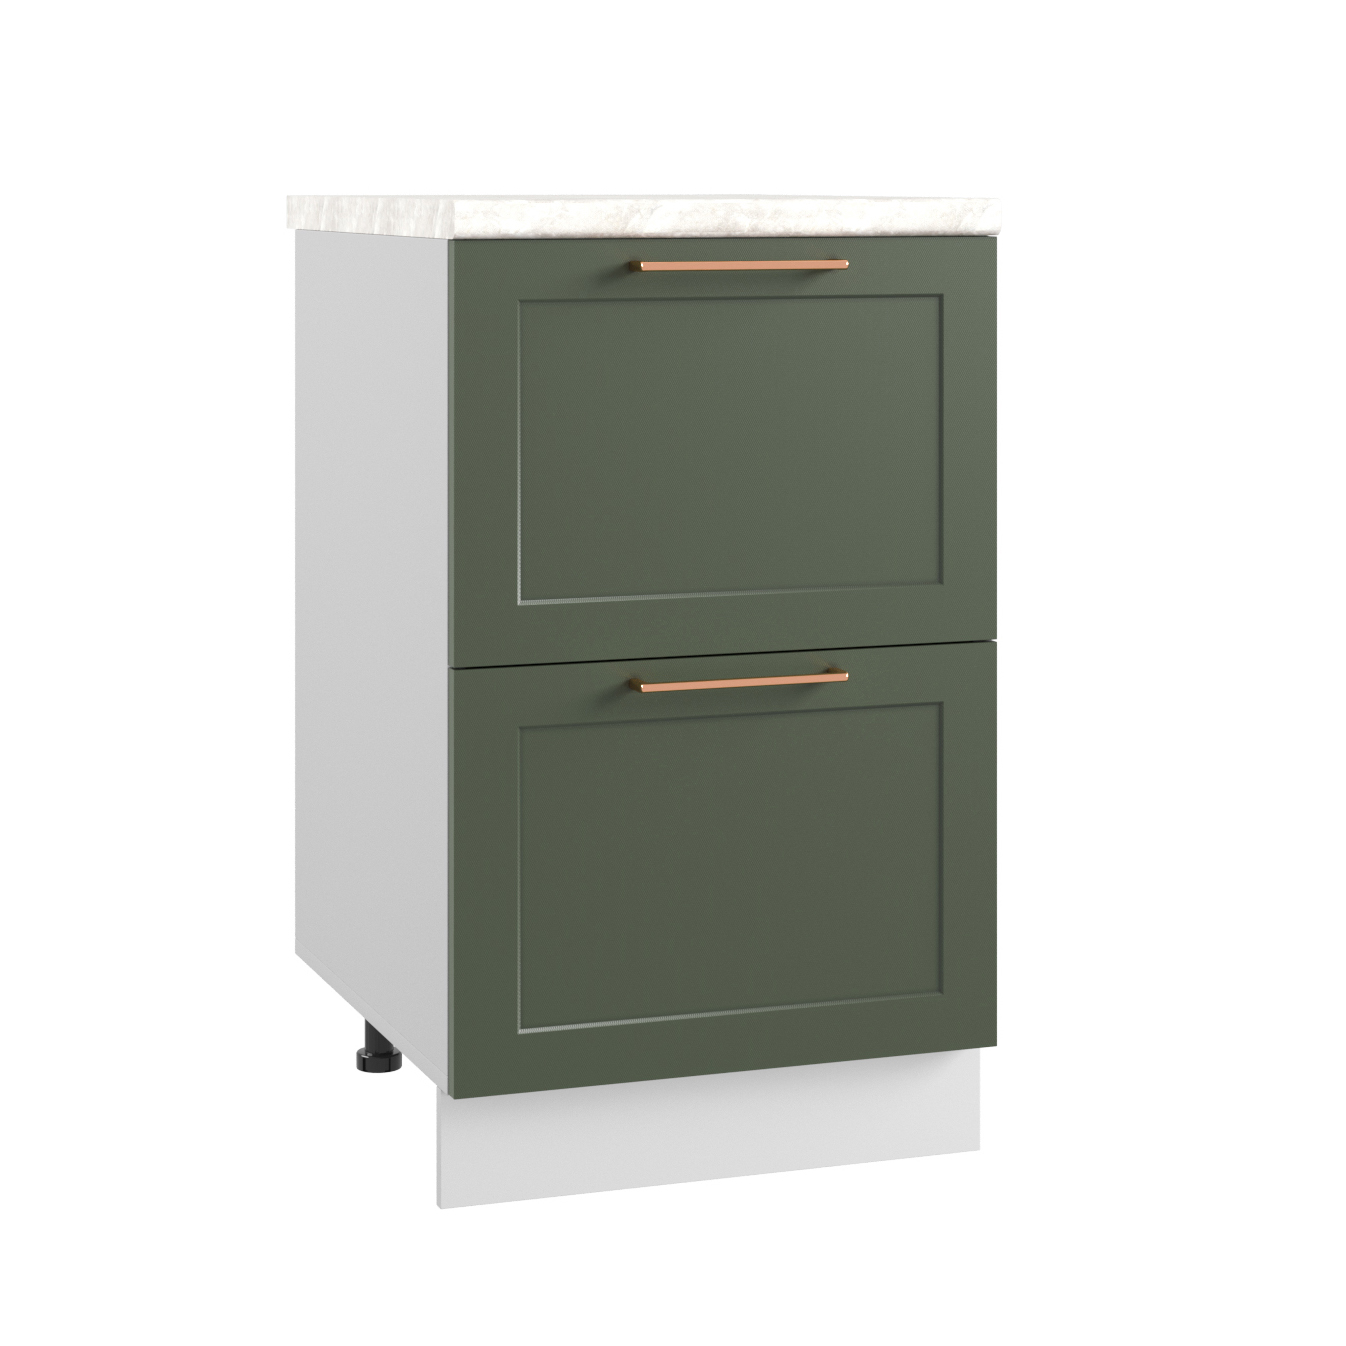 Кухня Квадро КМЯ 500 Шкаф нижний ящики с метабоксами